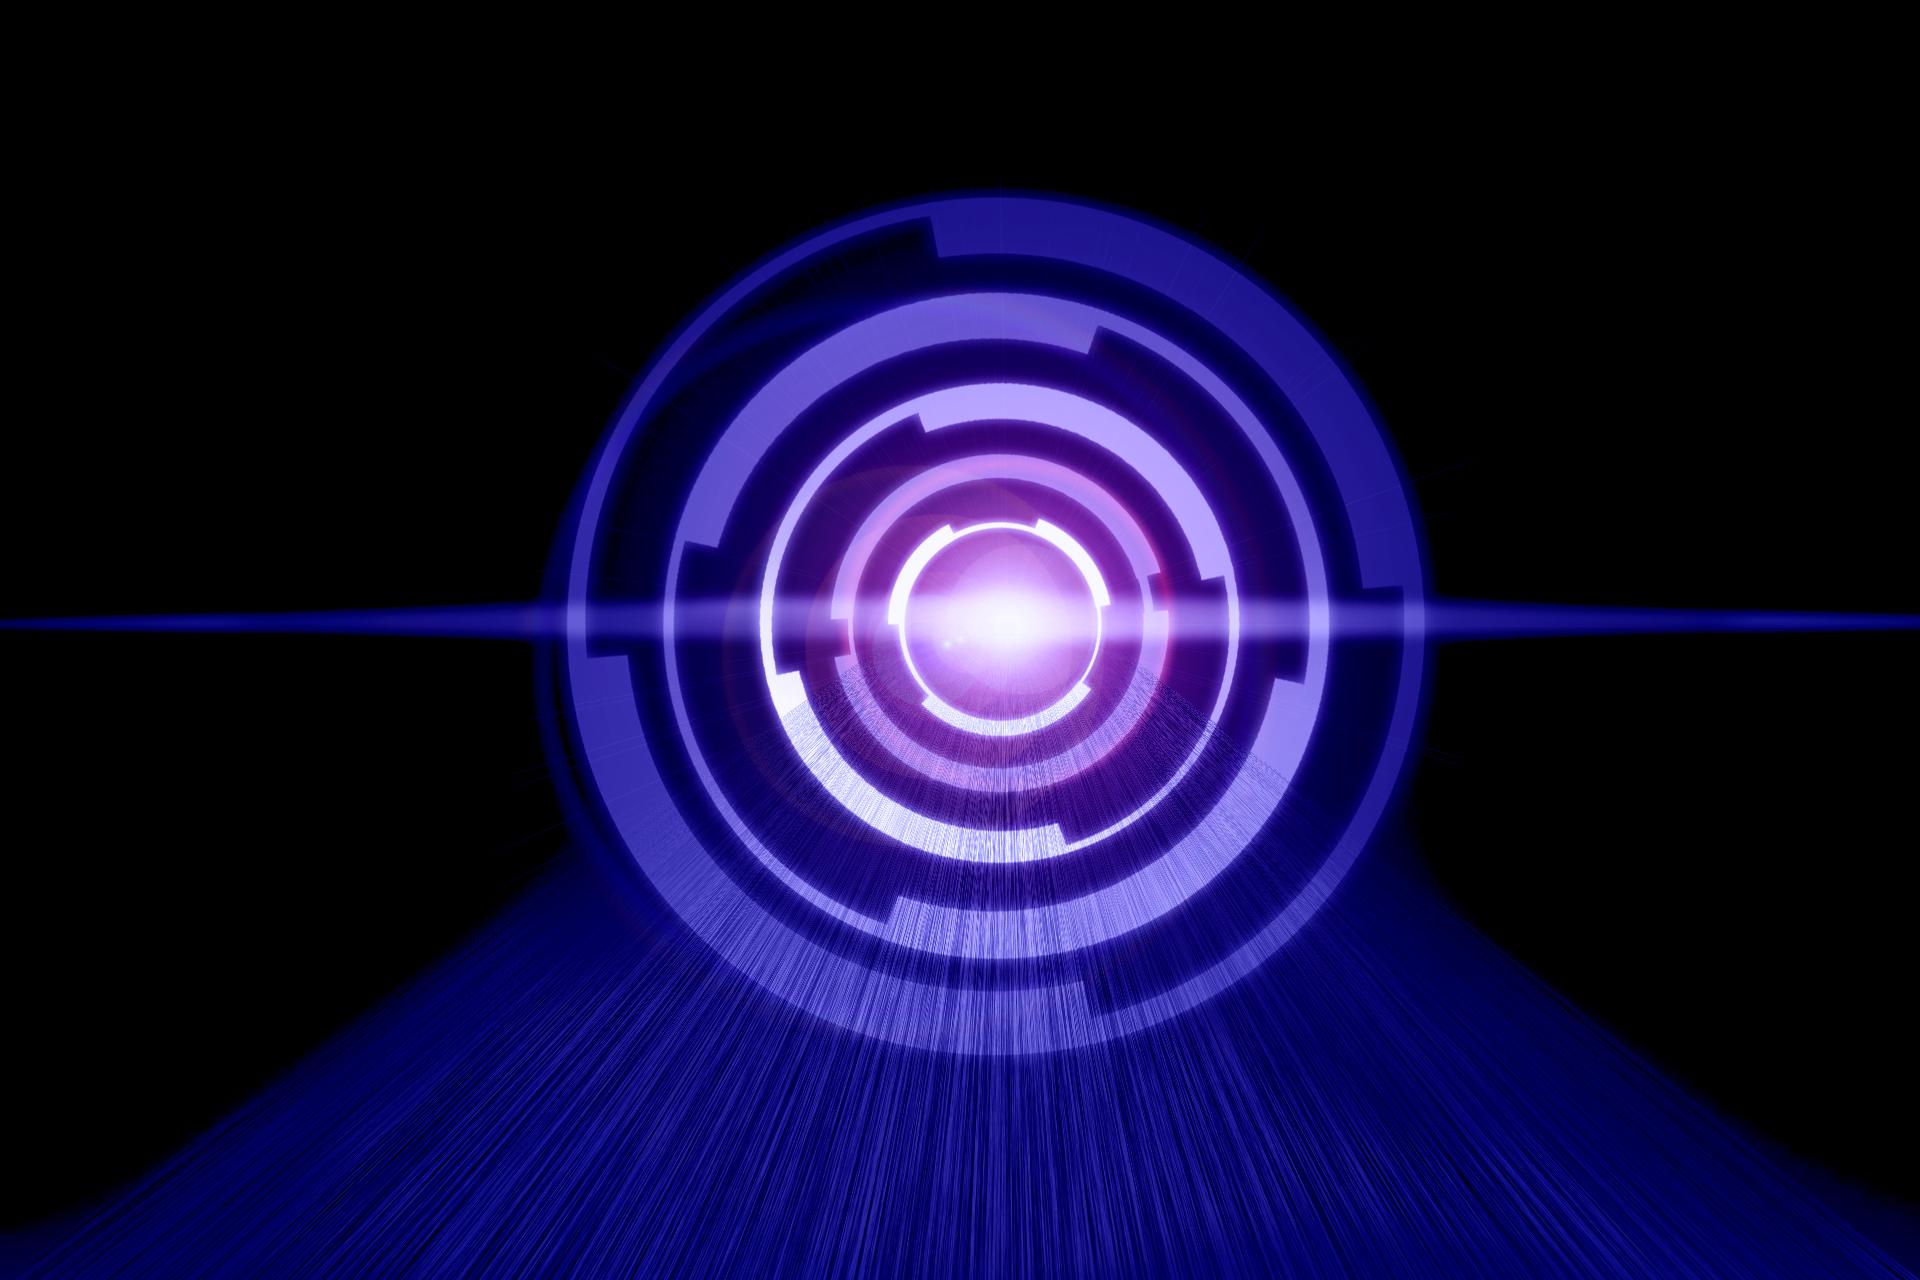 dark blue tech 1920x1280 hd by txvirus on deviantart